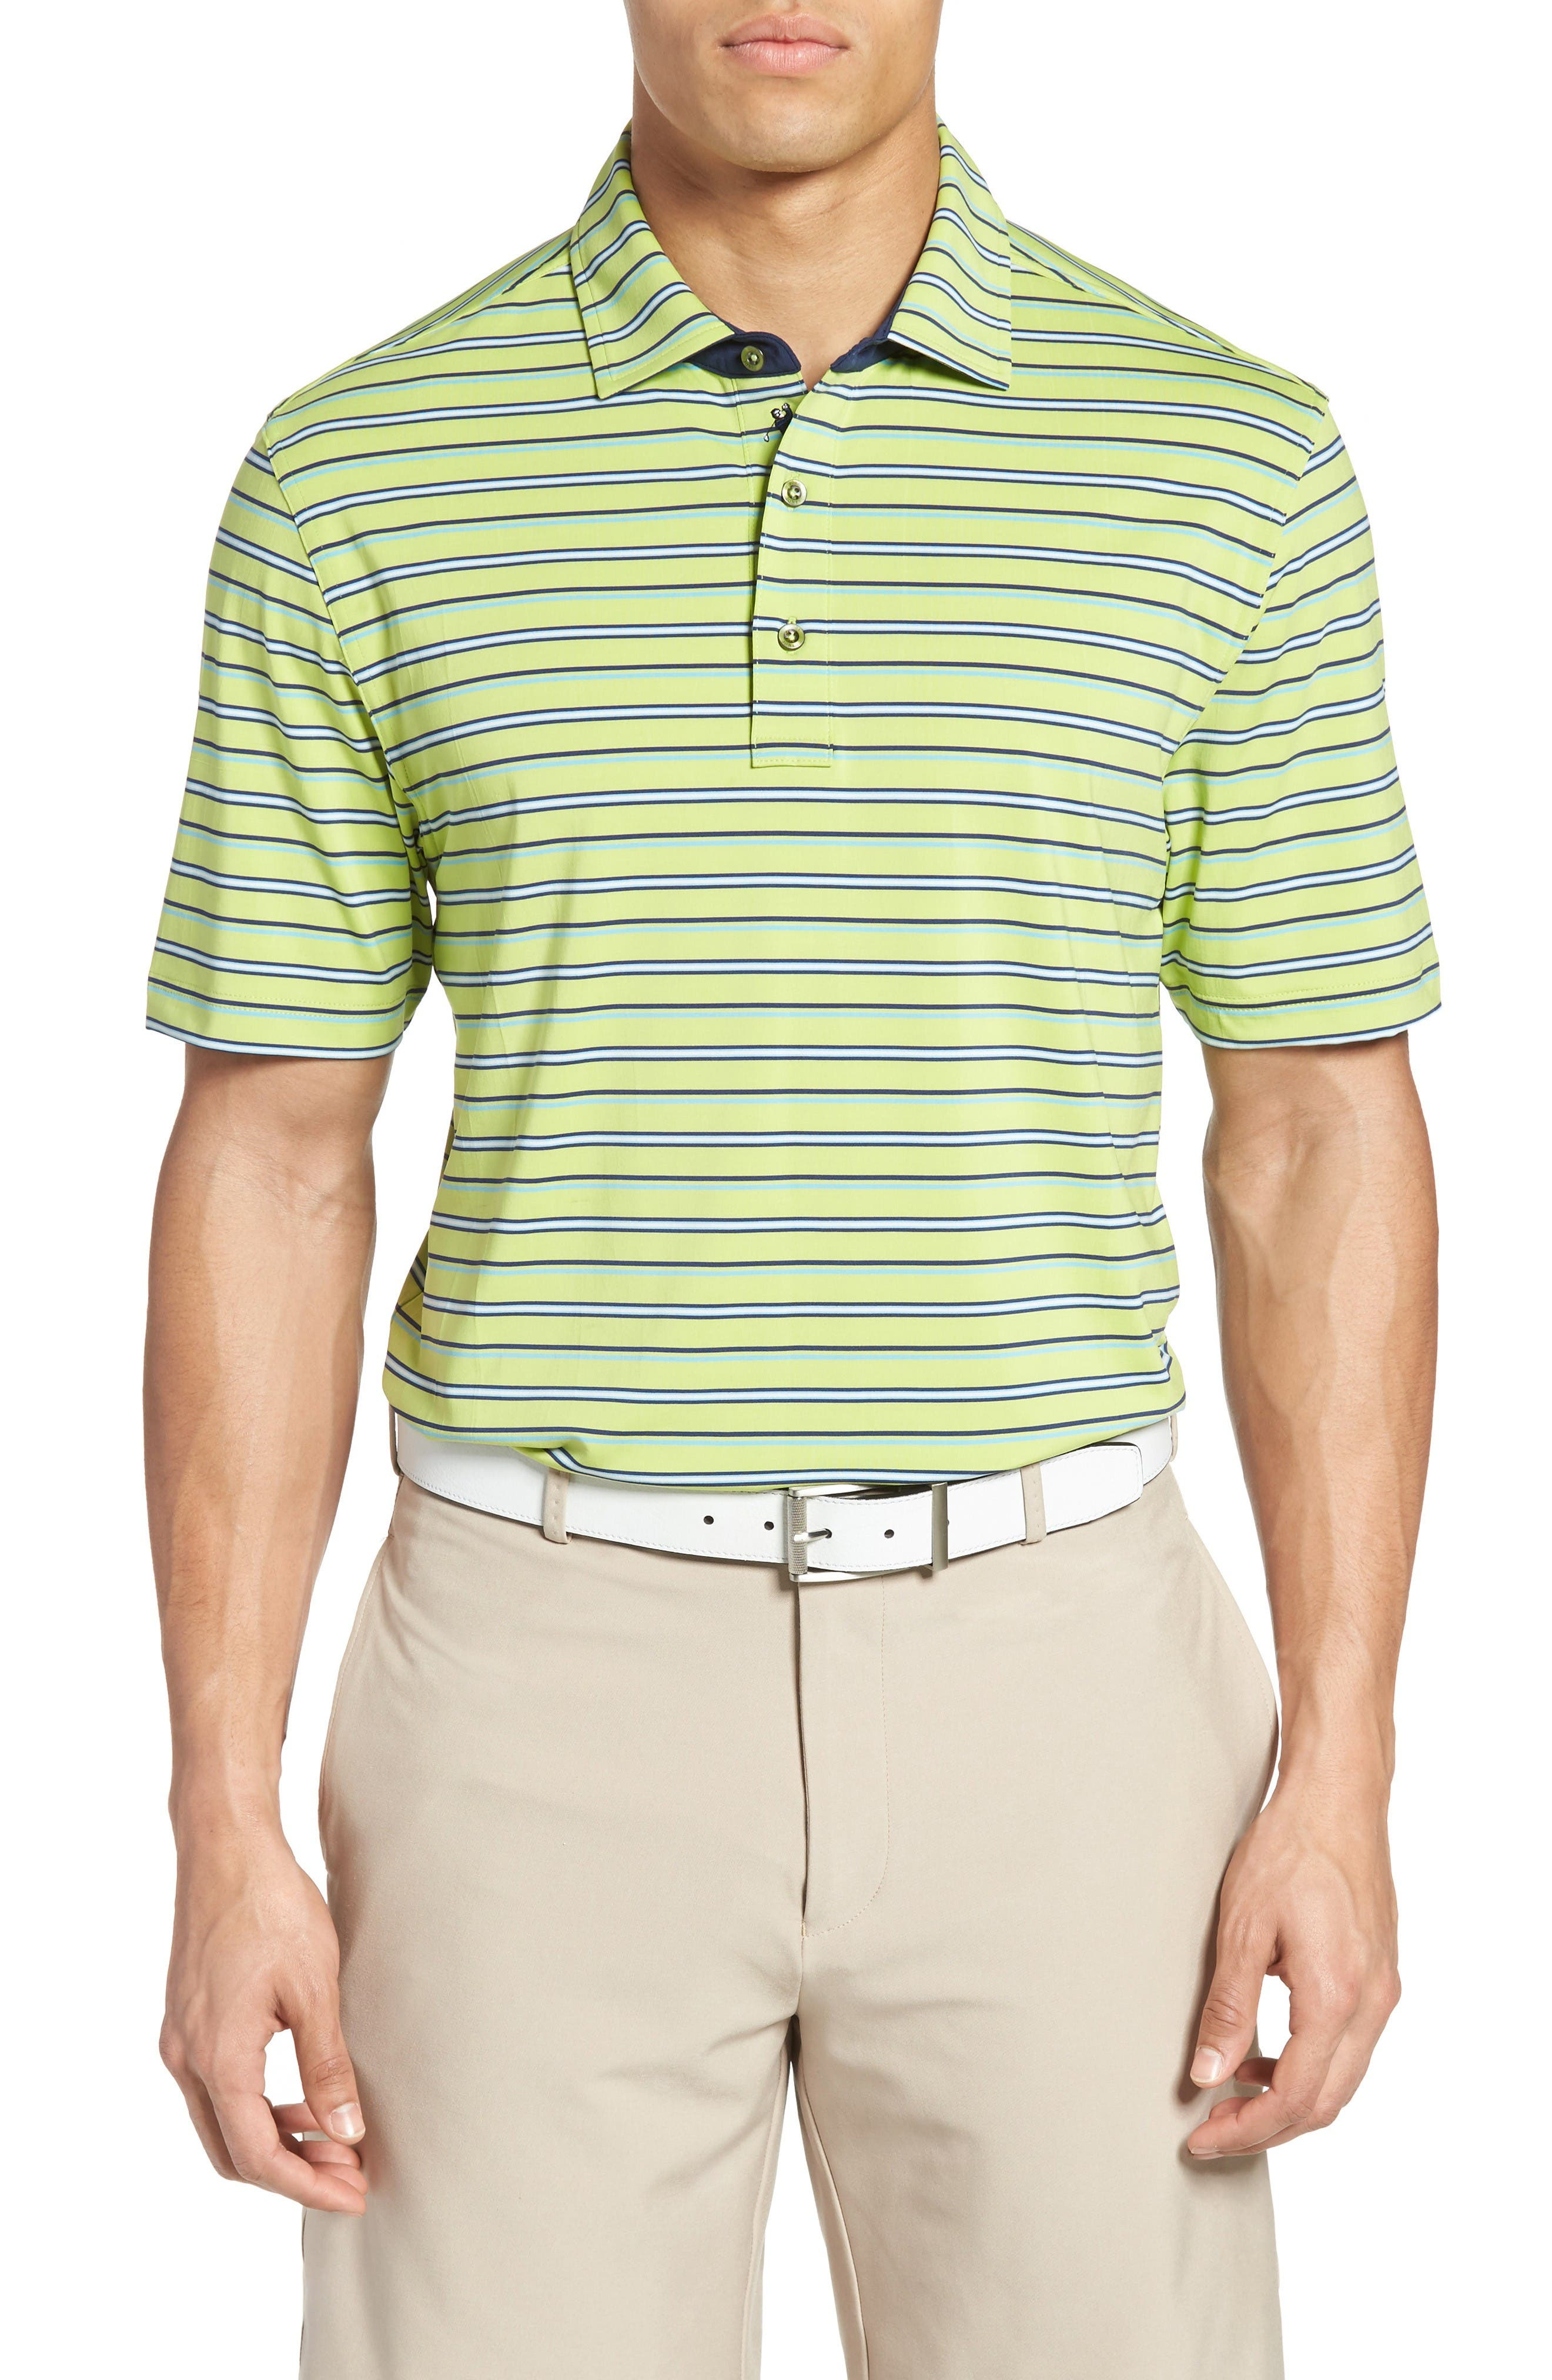 Bobby Jones XH20 Coney Stripe Stretch Golf Polo